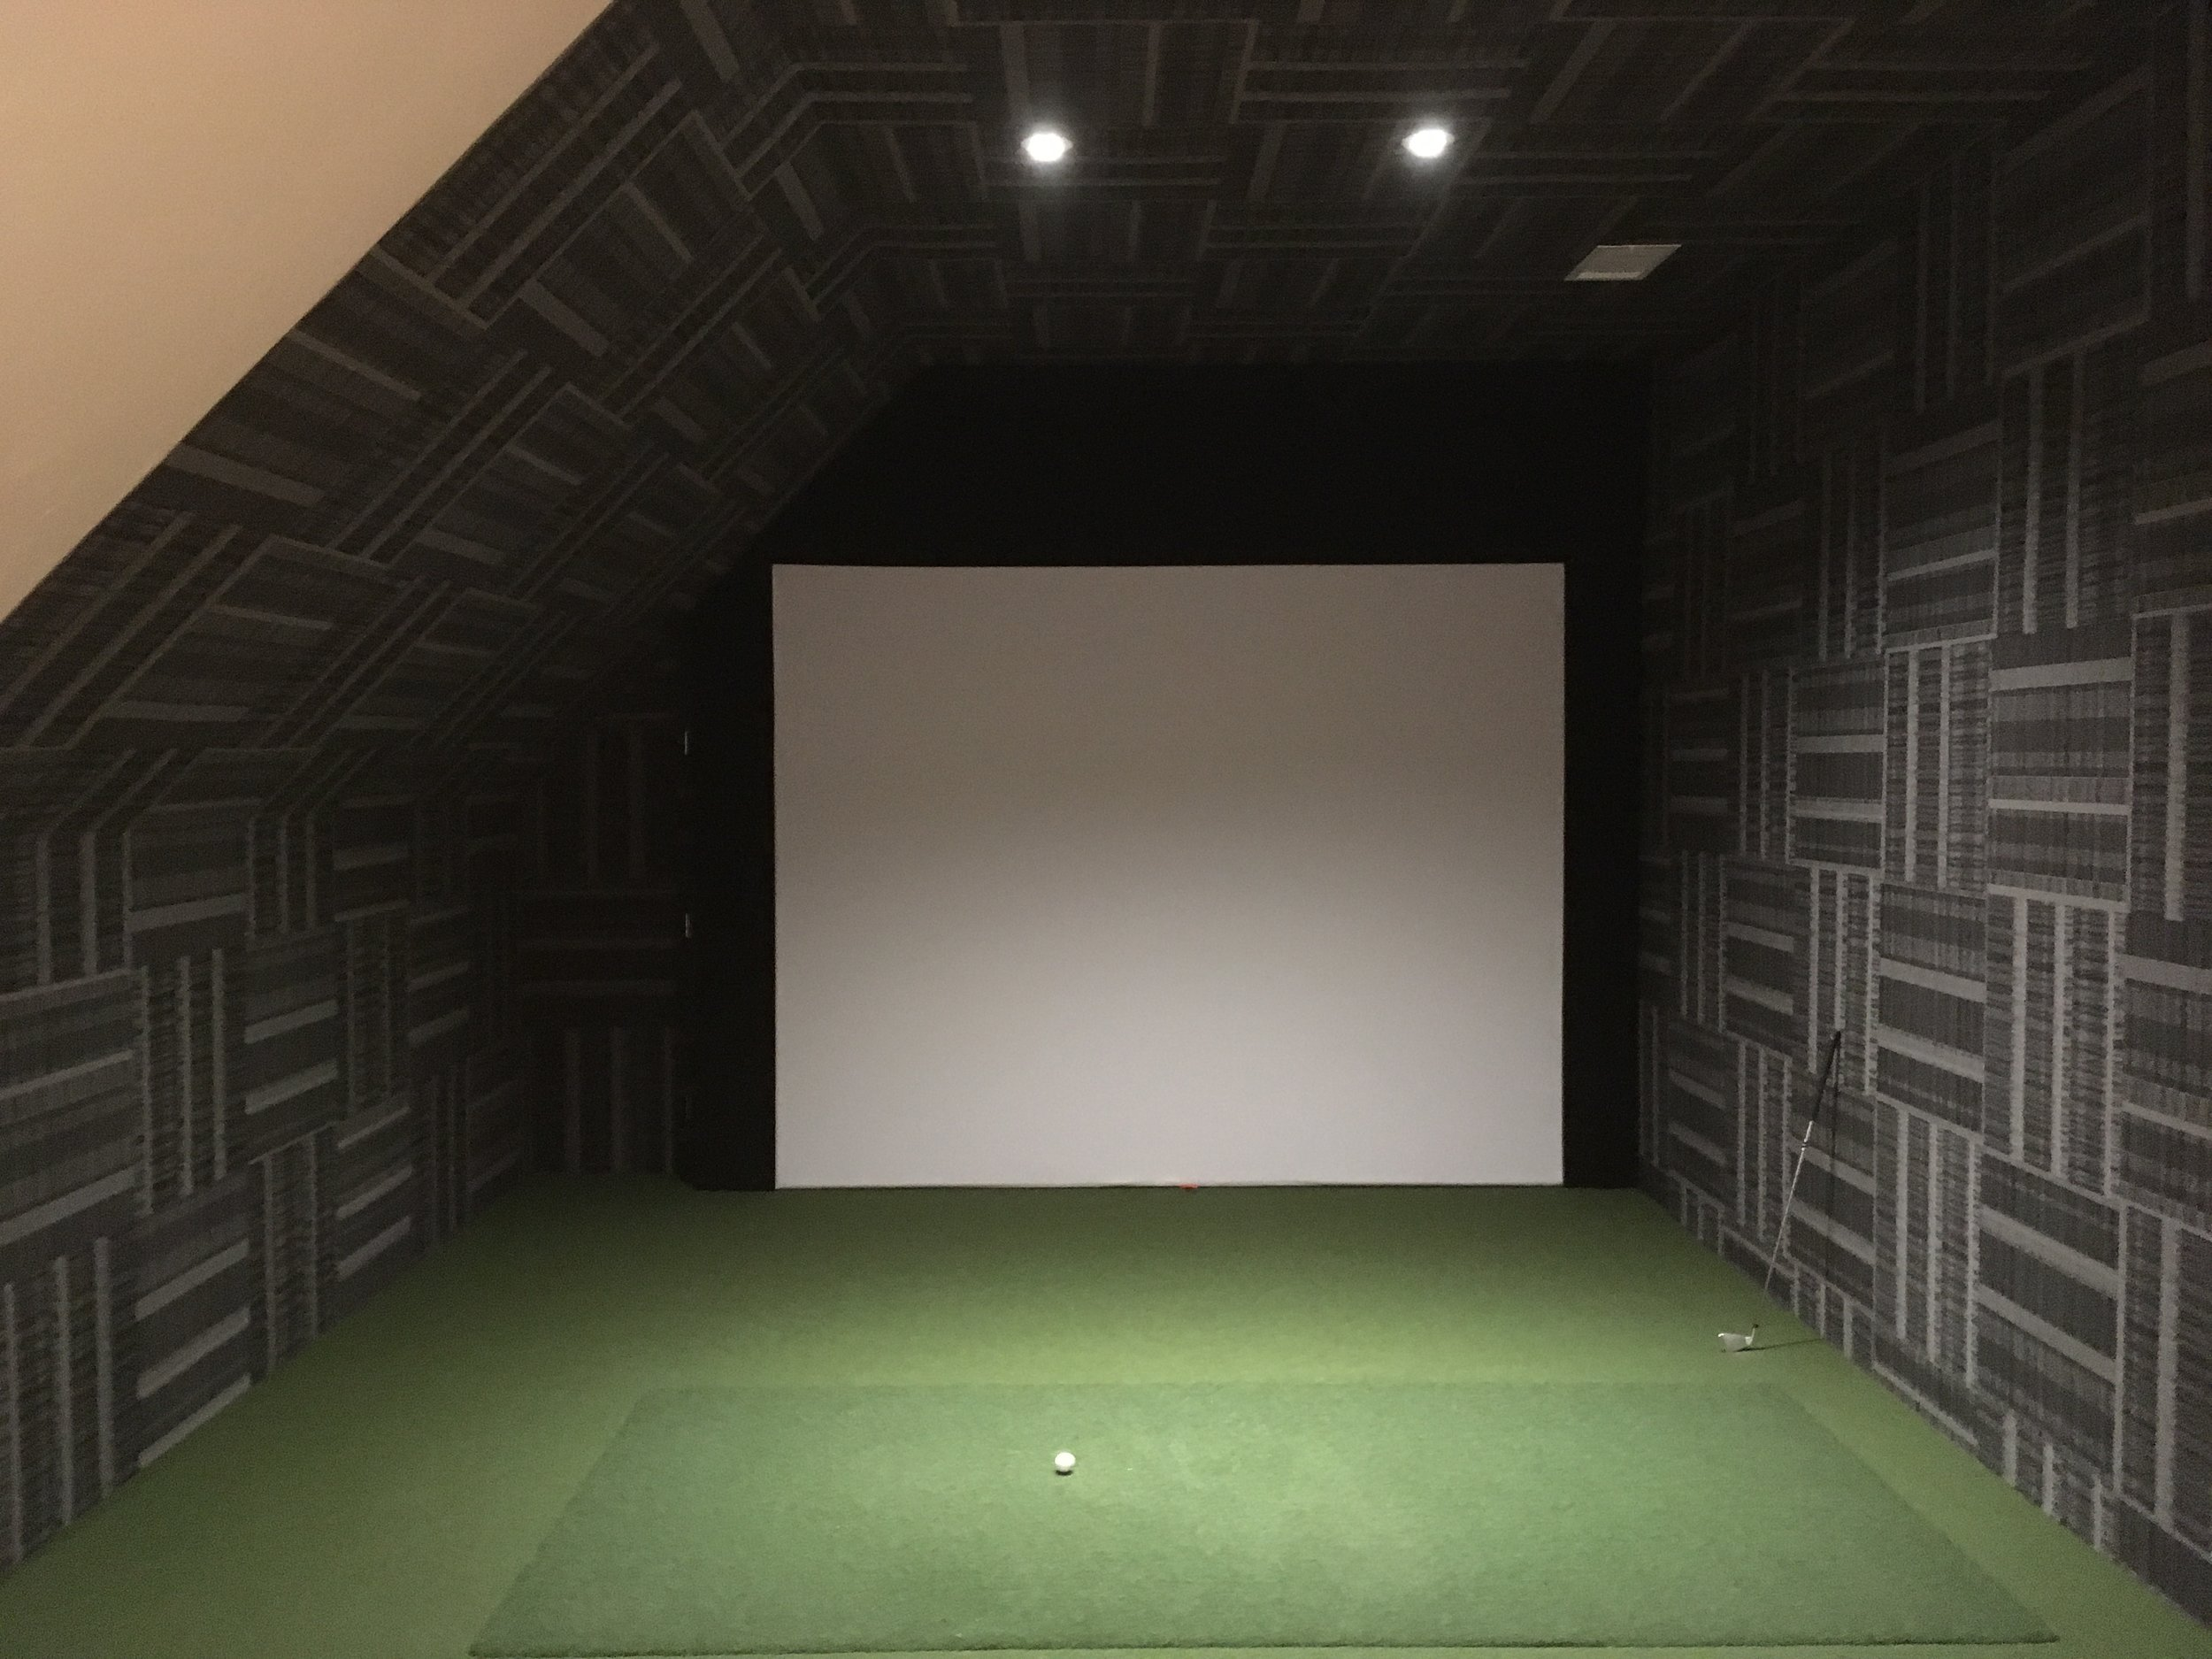 Attic space transformed into a personal golf simulator